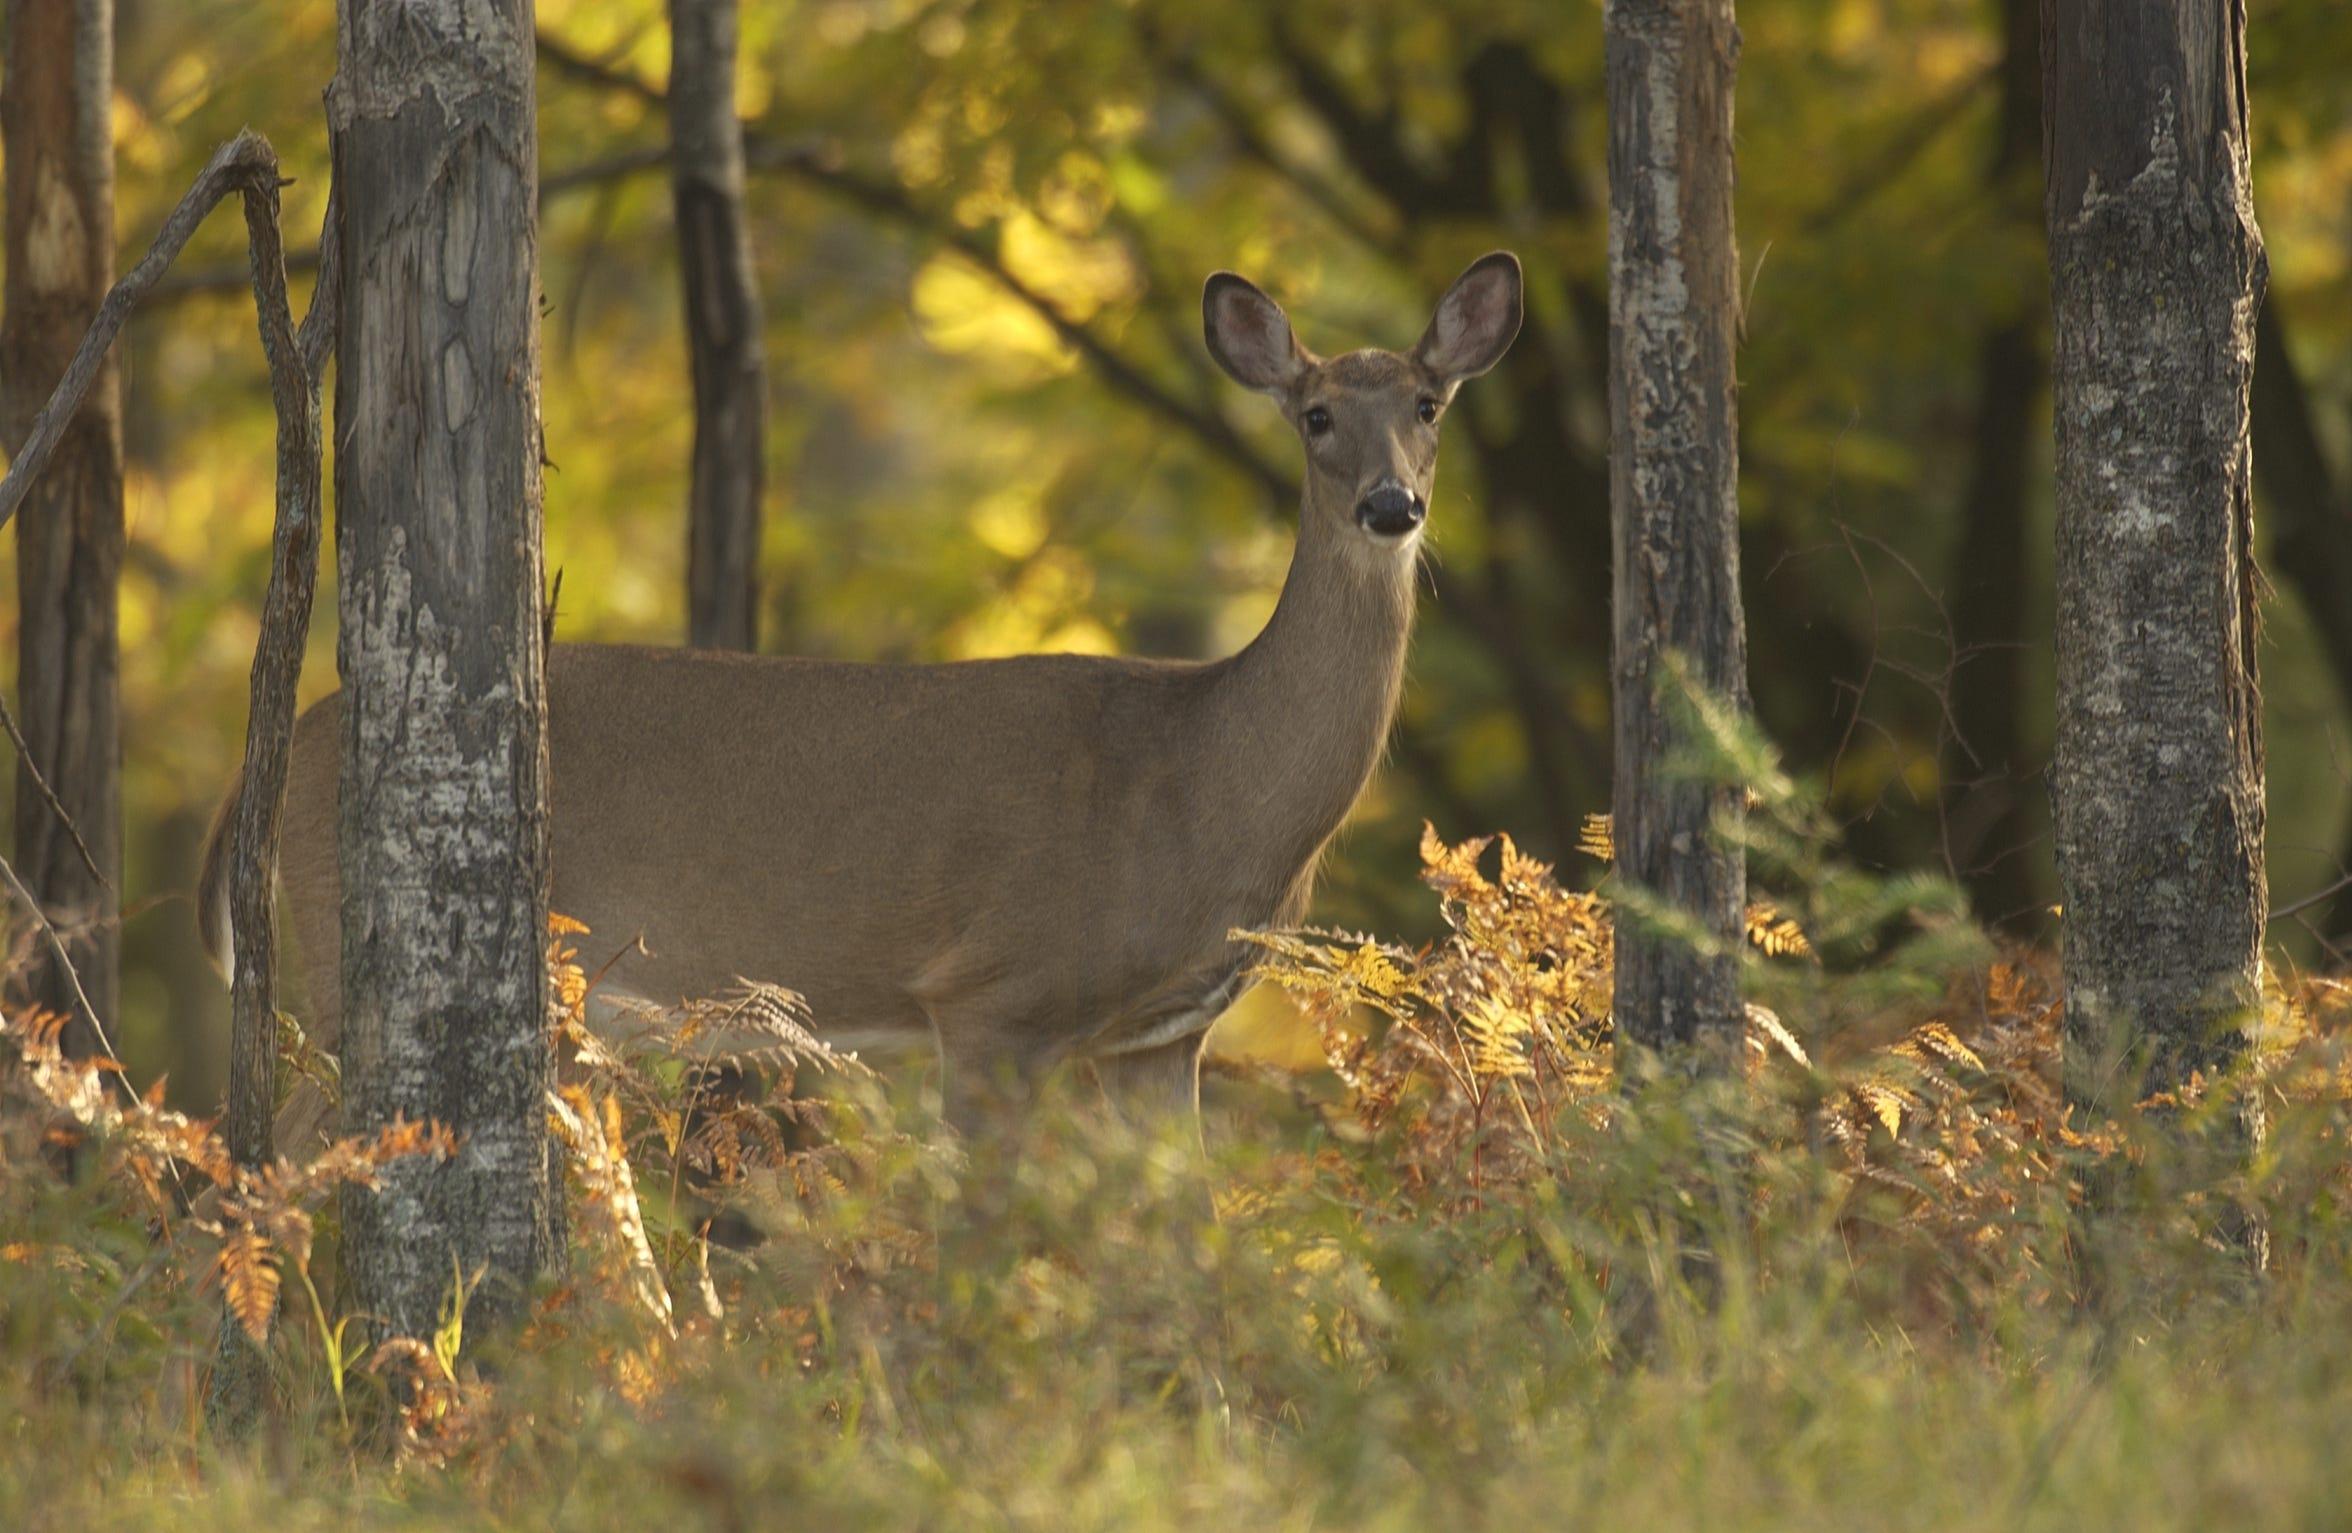 Hunter numbers continue decline in Michigan